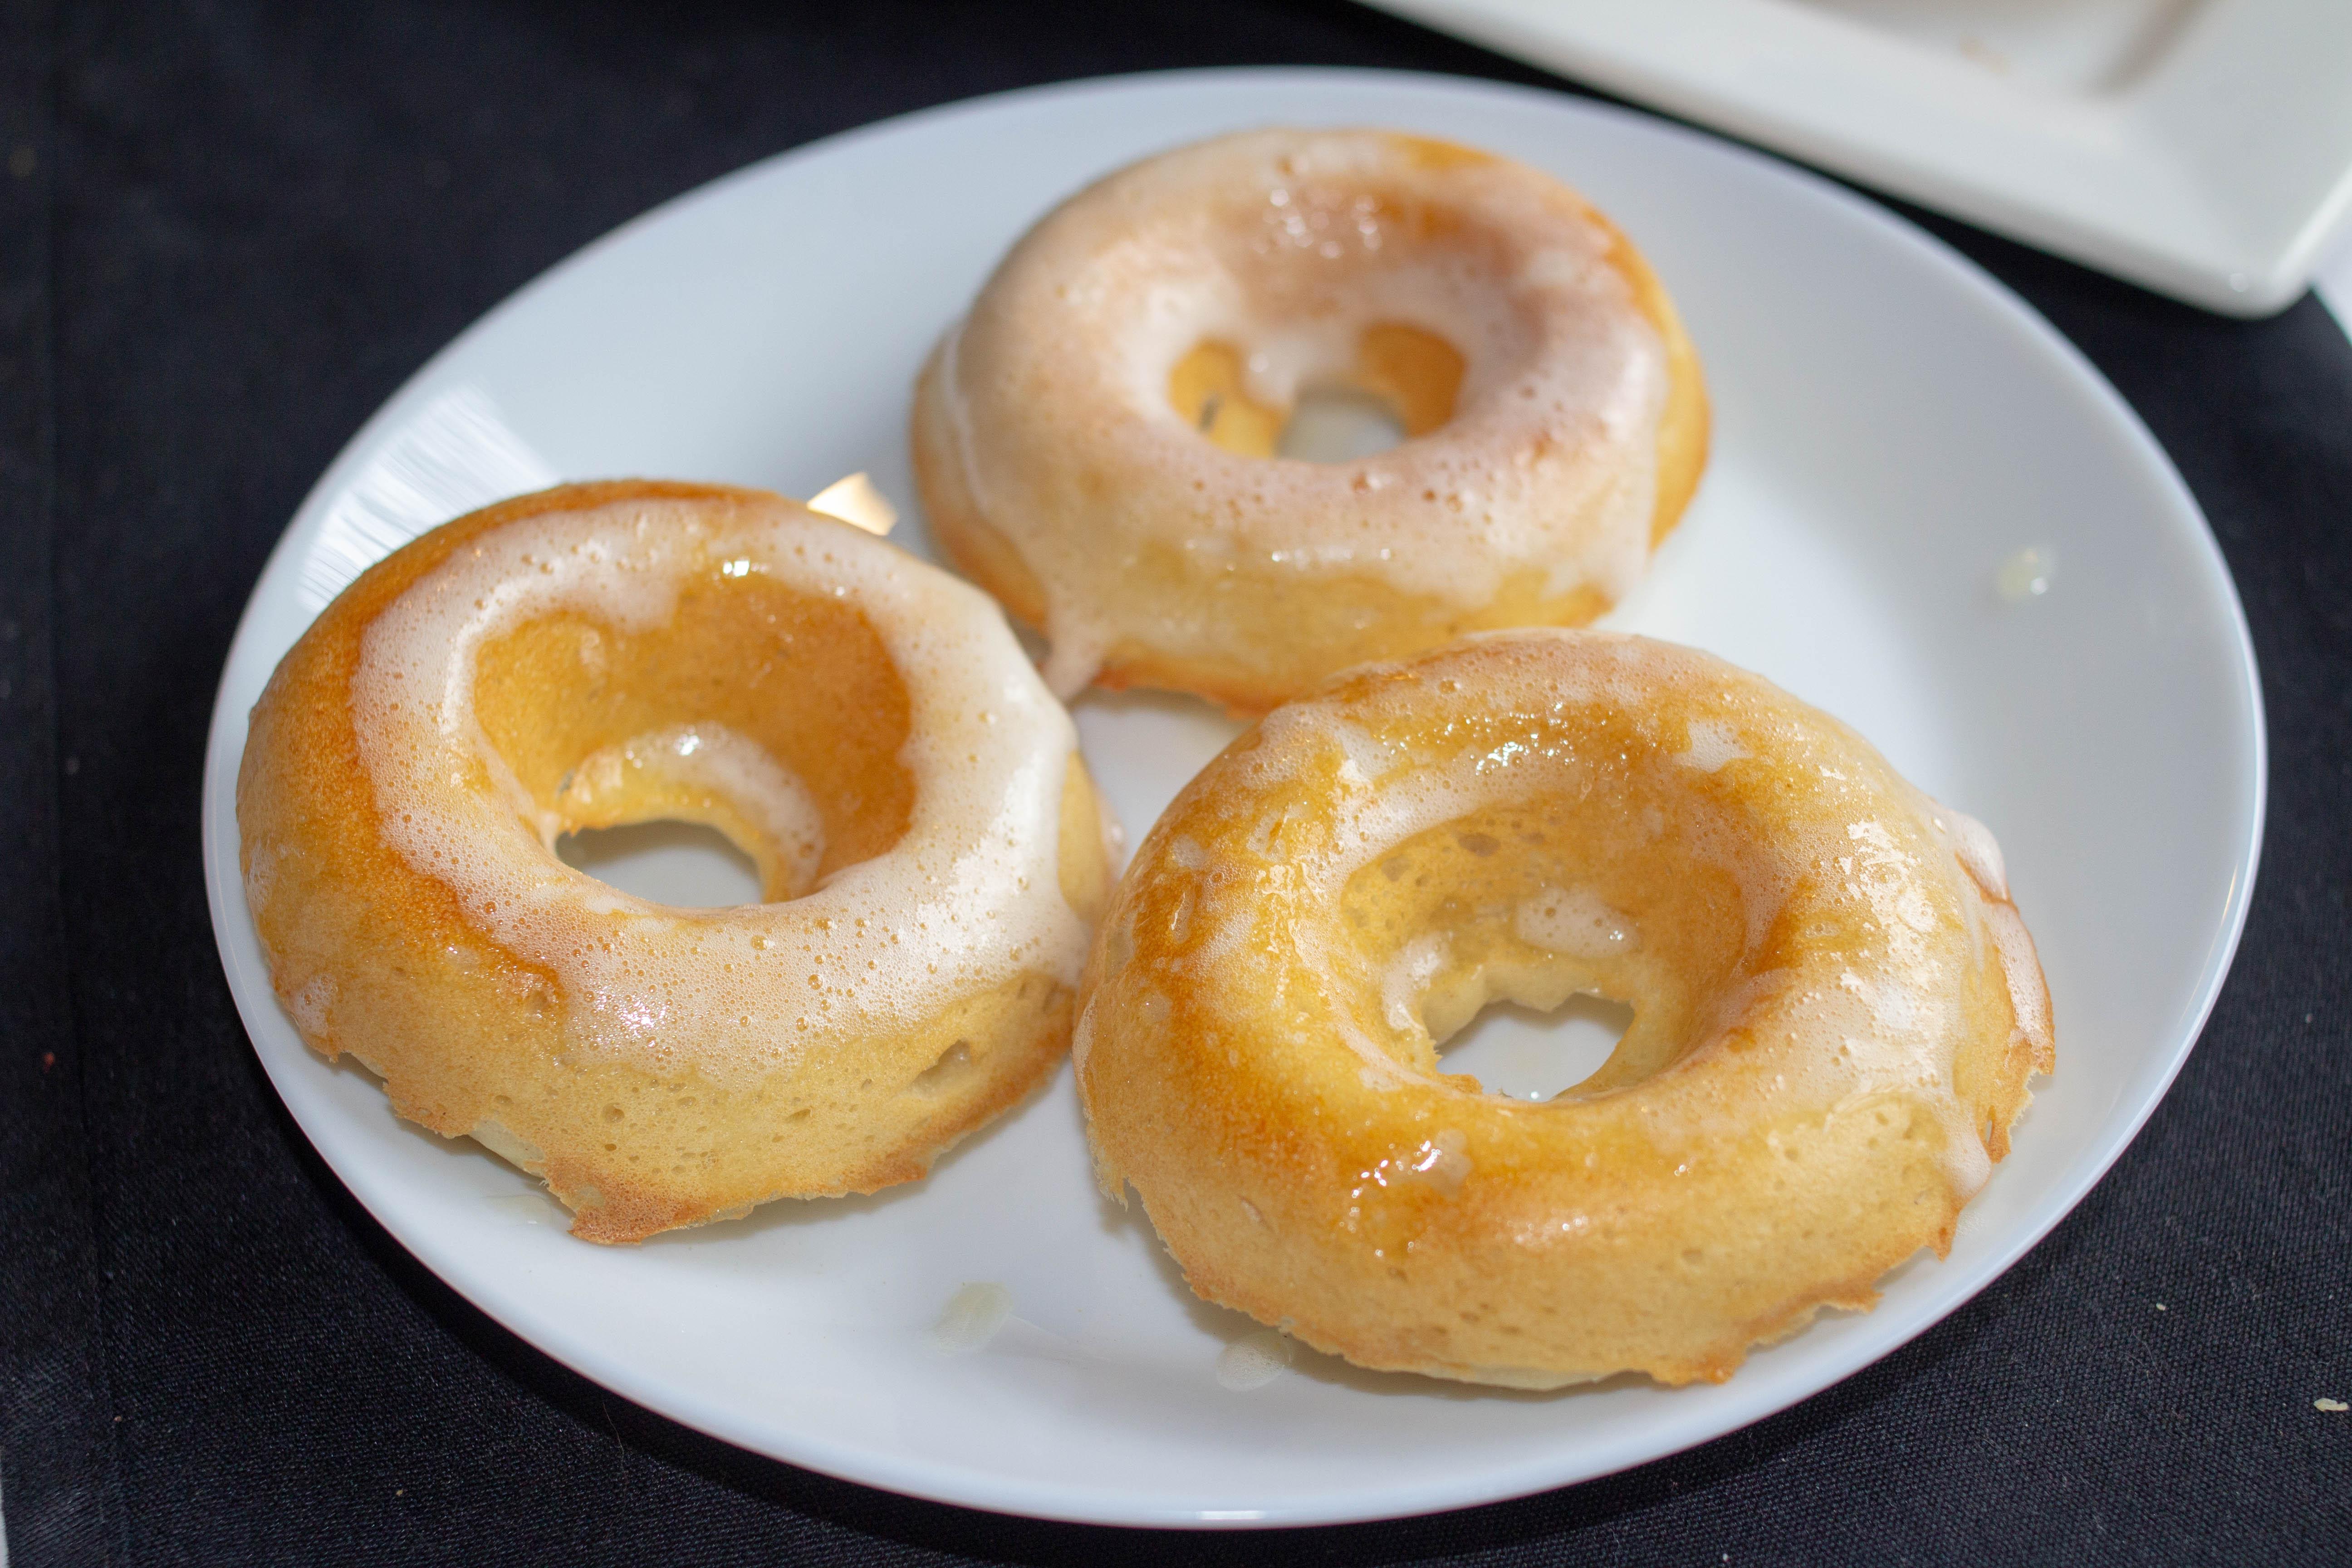 lemon donuts with glaze